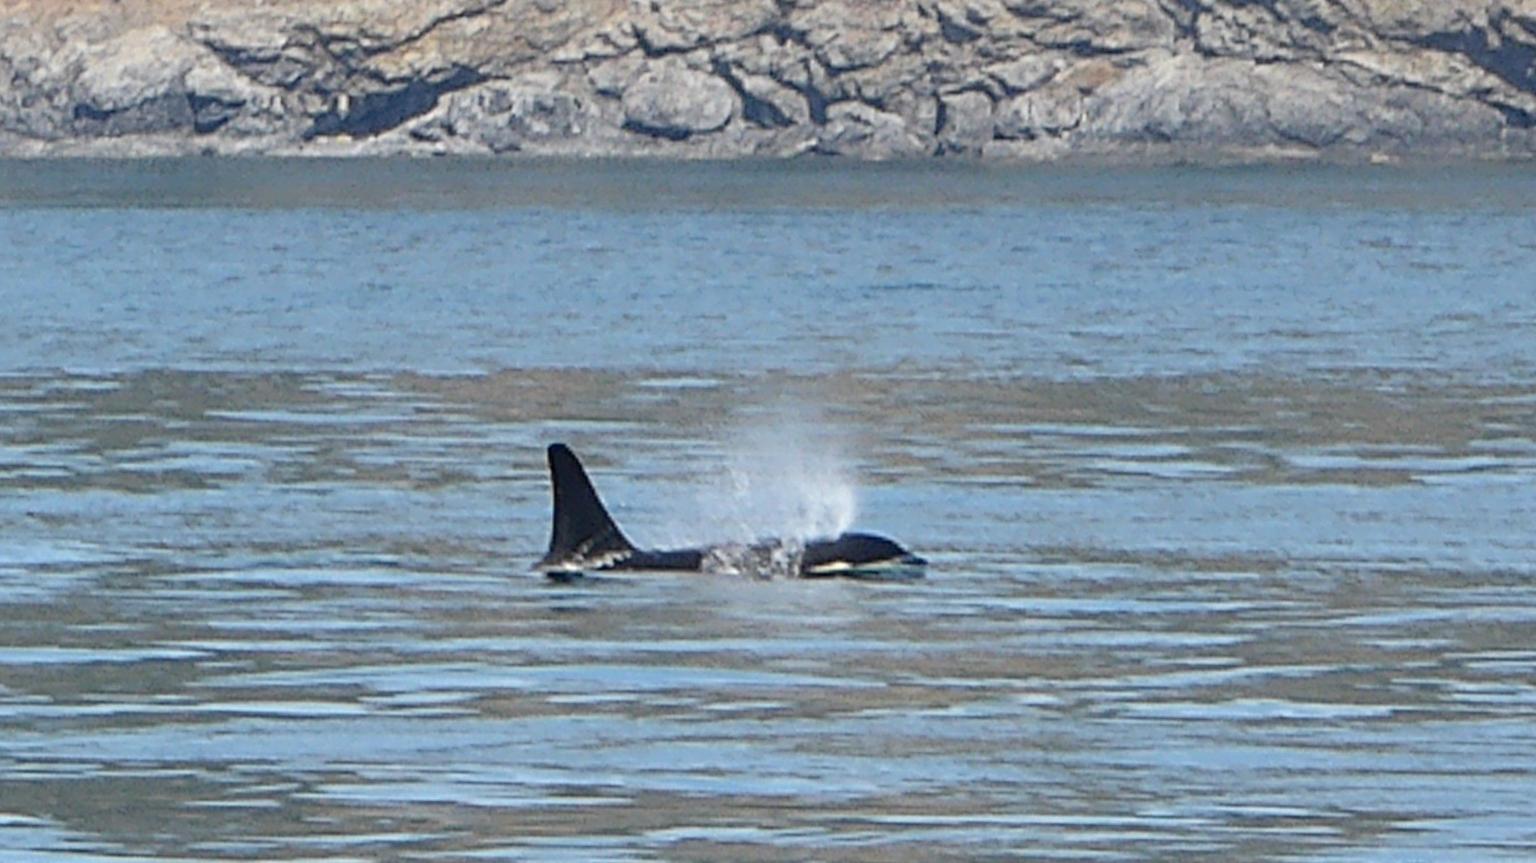 MÁS FOTOS, Victoria Whale and Wildlife Cruise